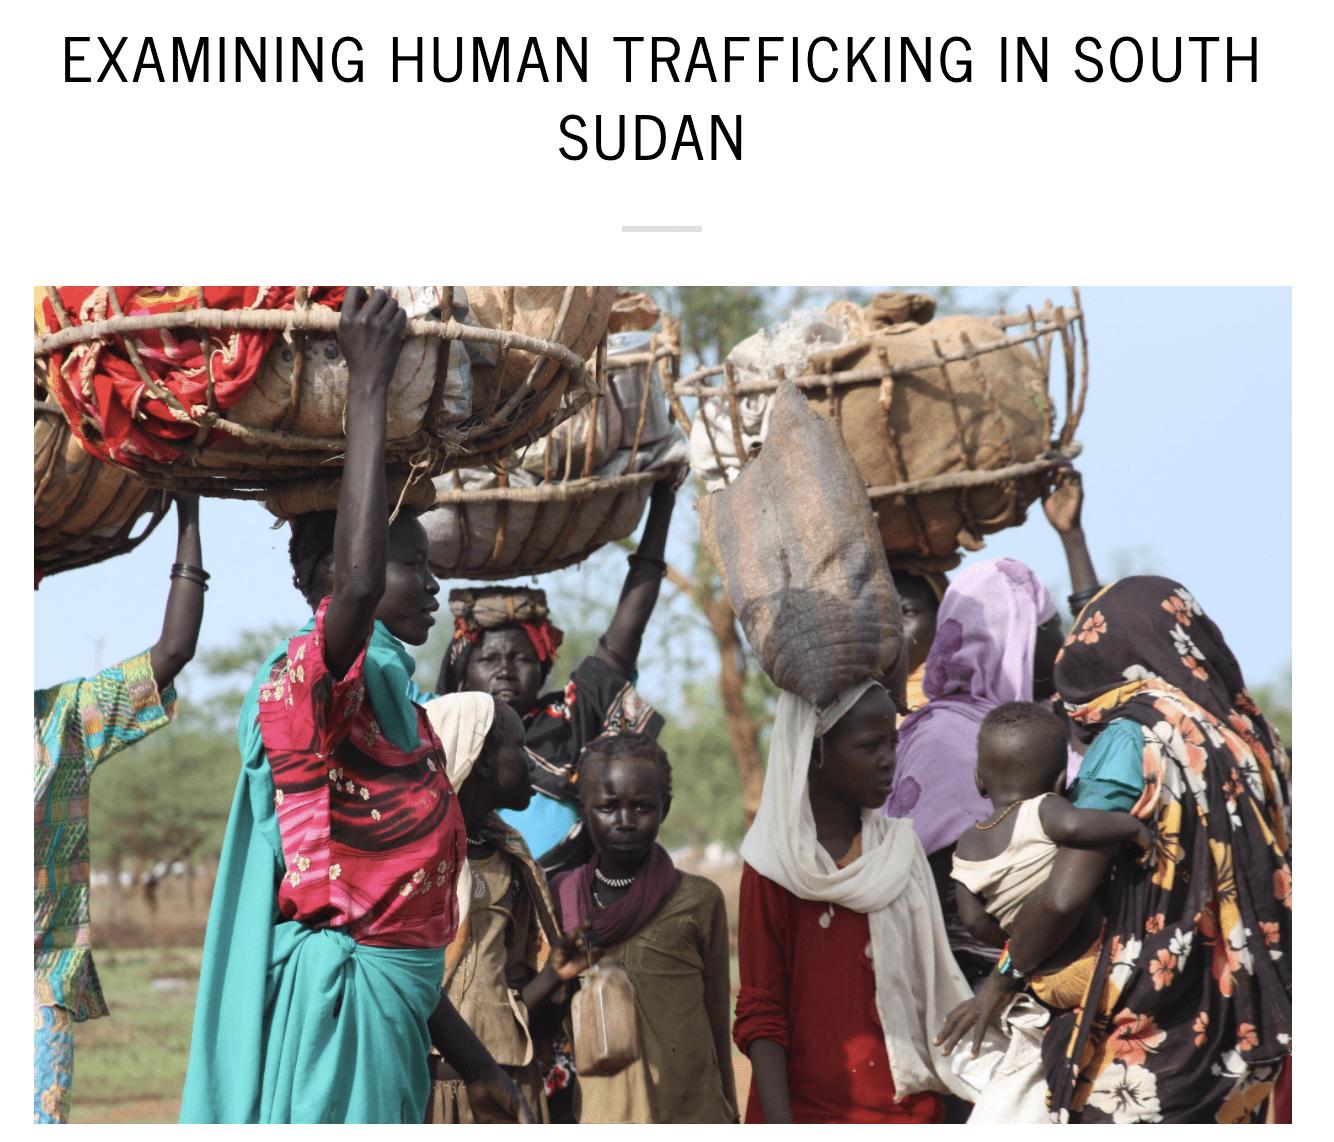 Examining Human Trafficking in South Sudan